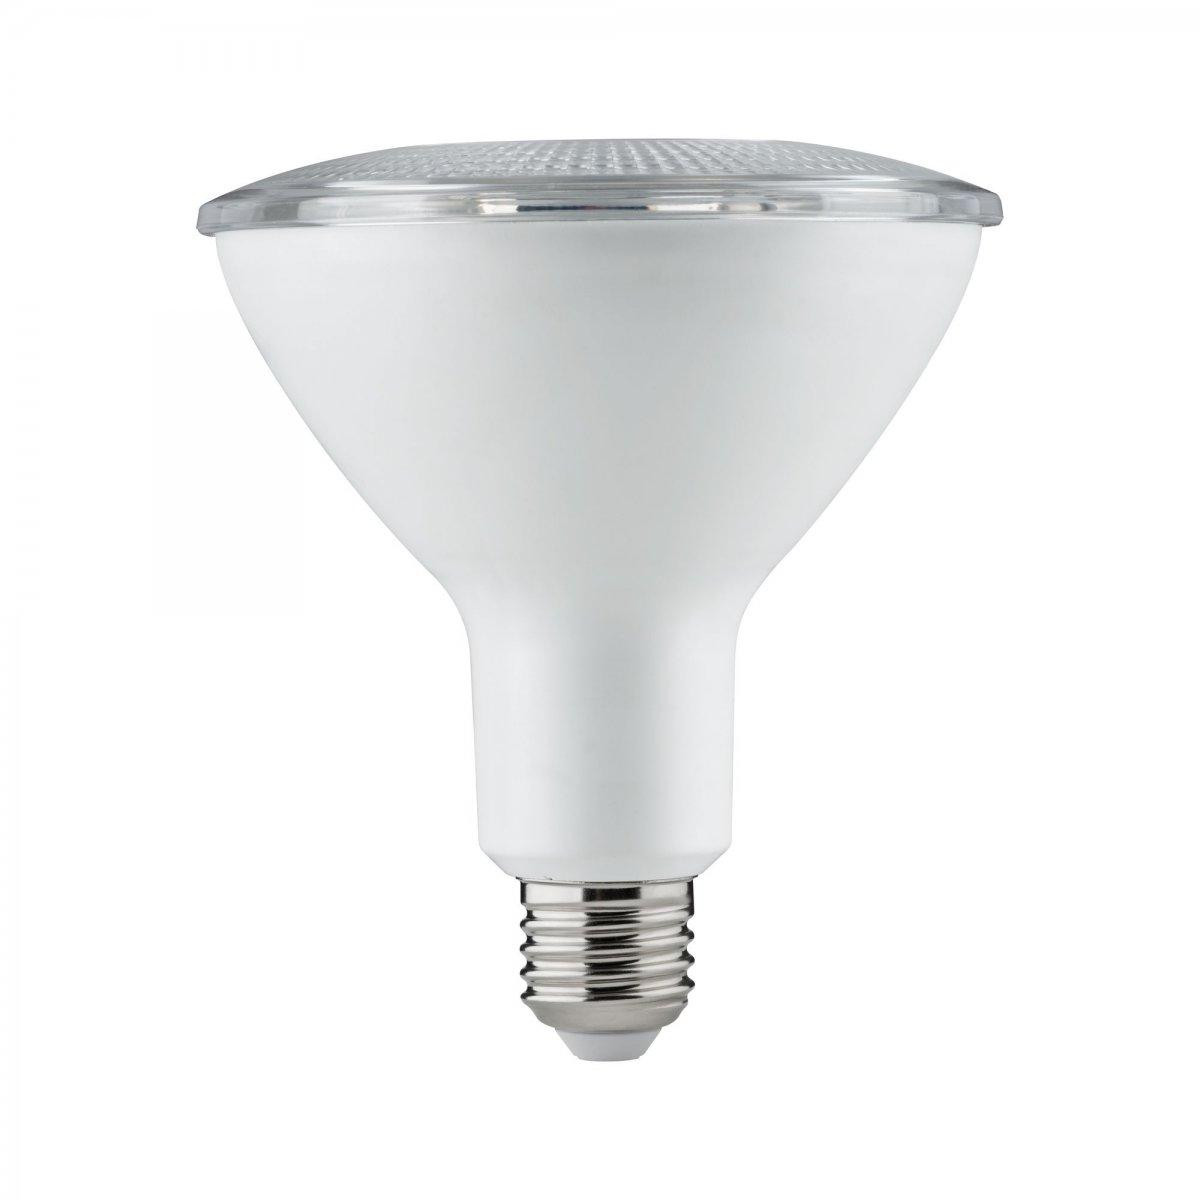 Paulmann No. 28445 LED Reflektorlampe PAR 38 10 Watt E27 Warmweiß ...